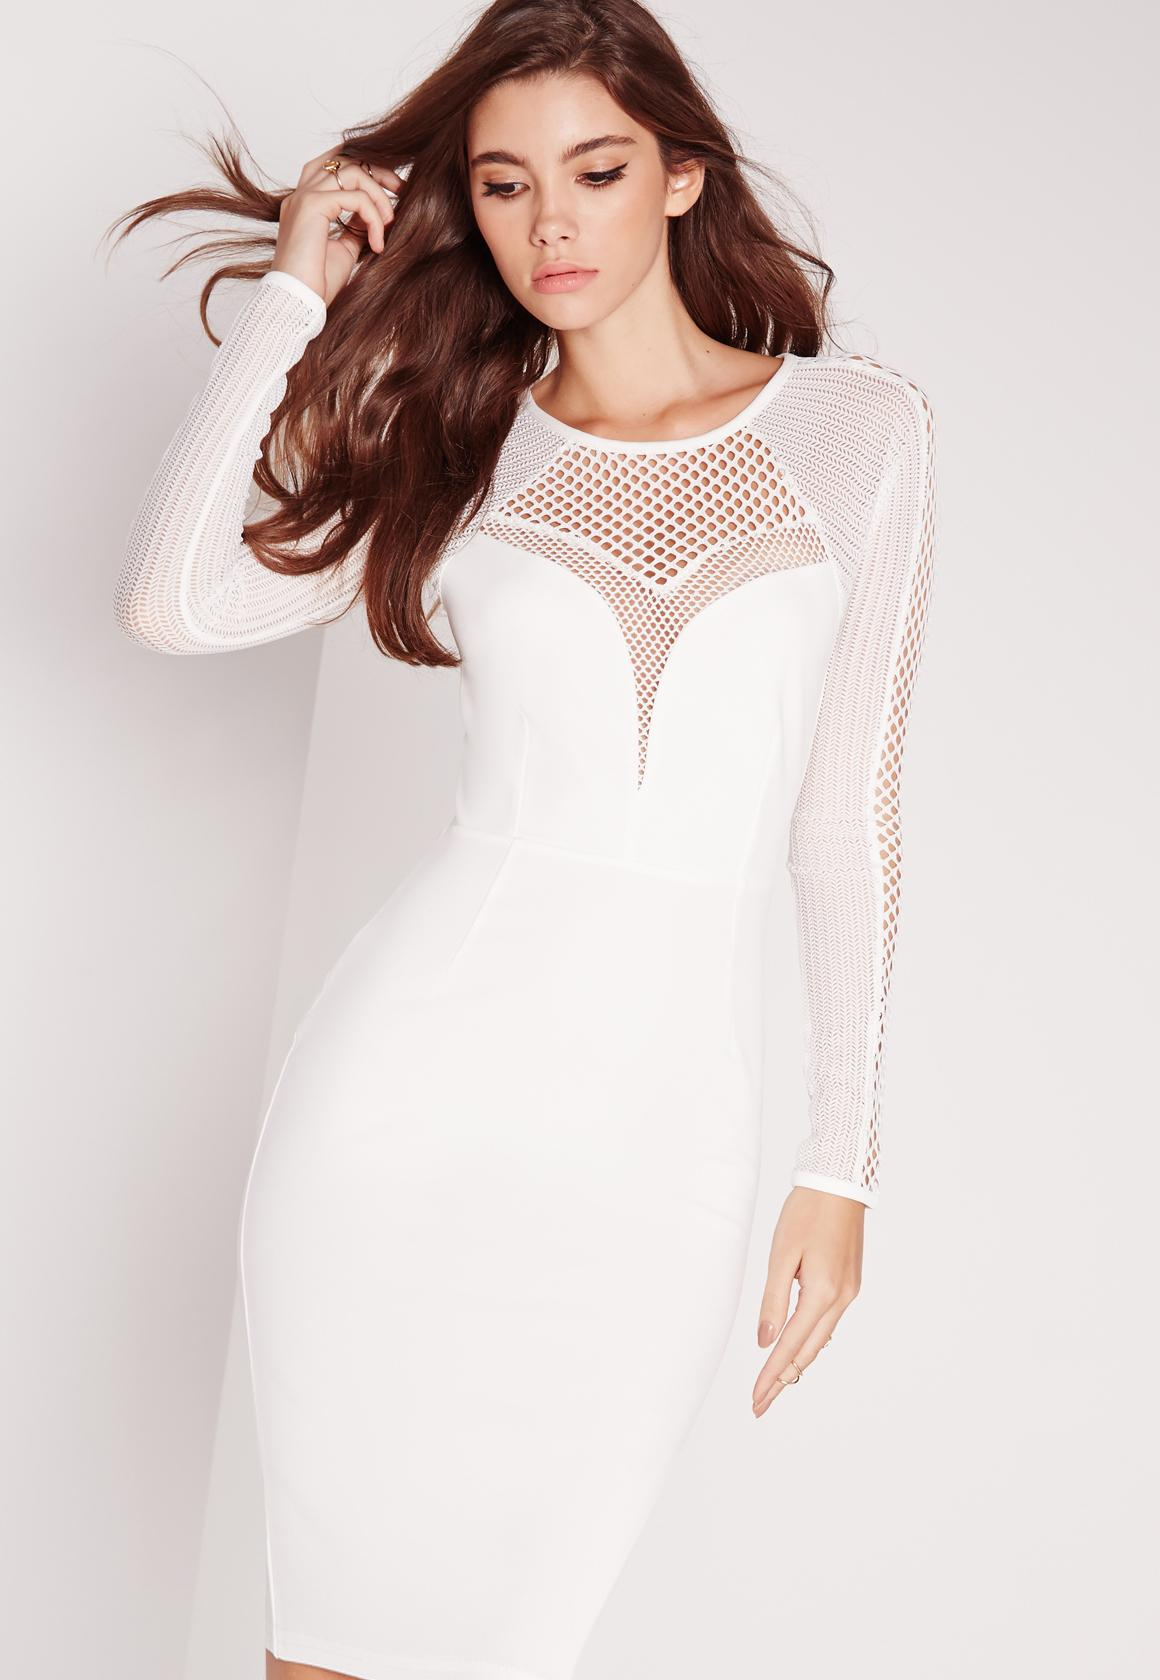 Long sleeve midi white dress.